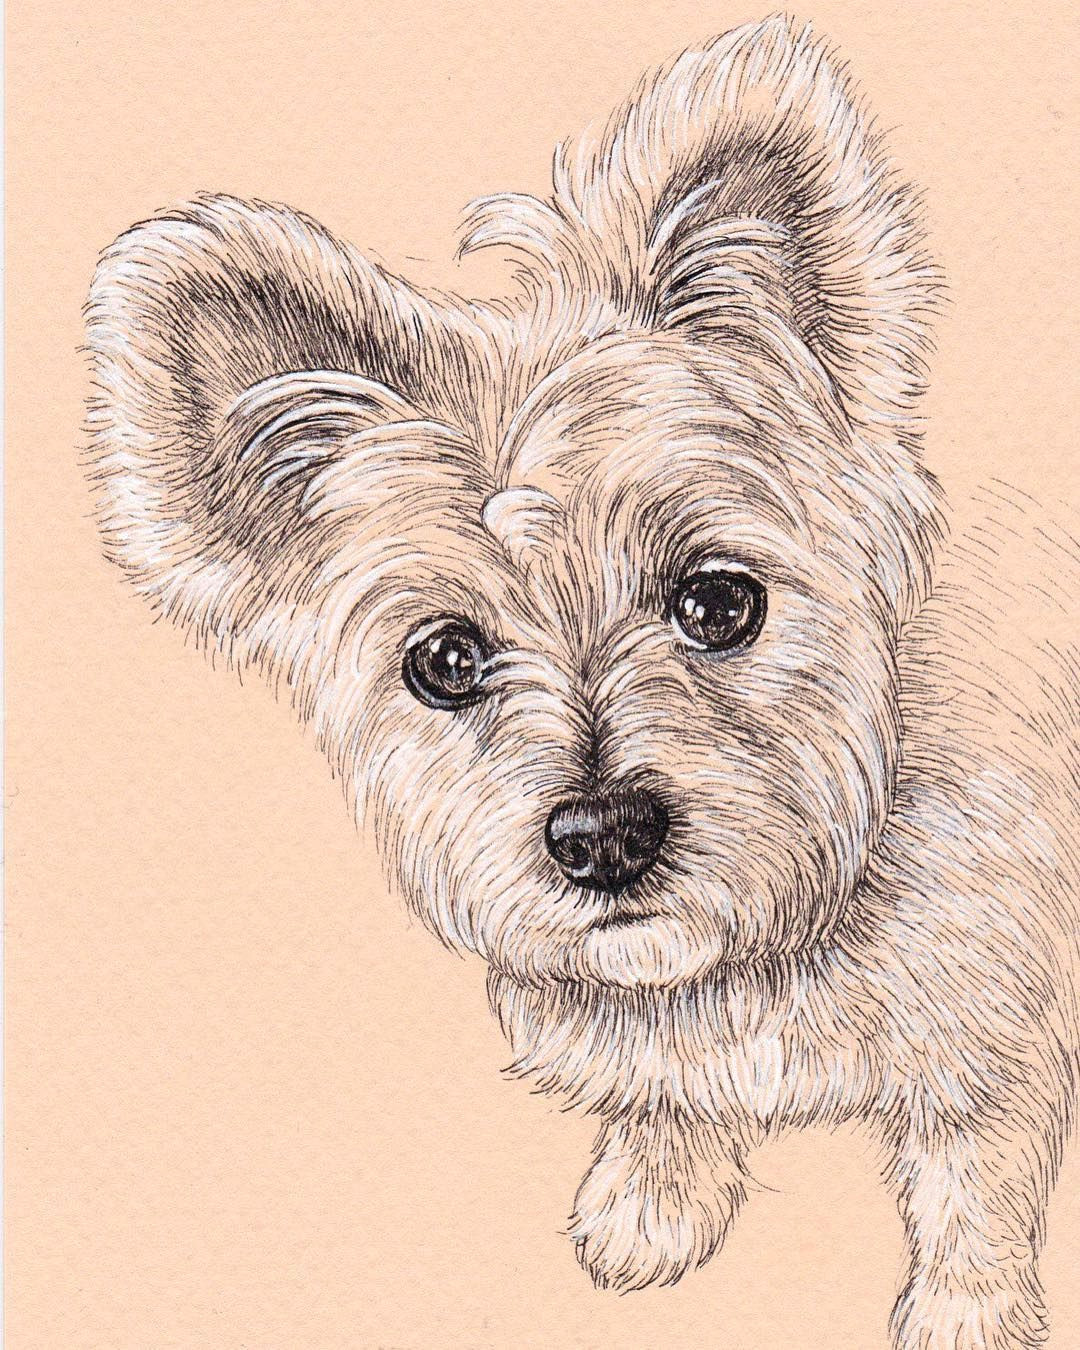 lisa creative lab custom pet portrait from photo dog portrait sketch cat portrait card dog mom gift present ideas fineliner art micron pen